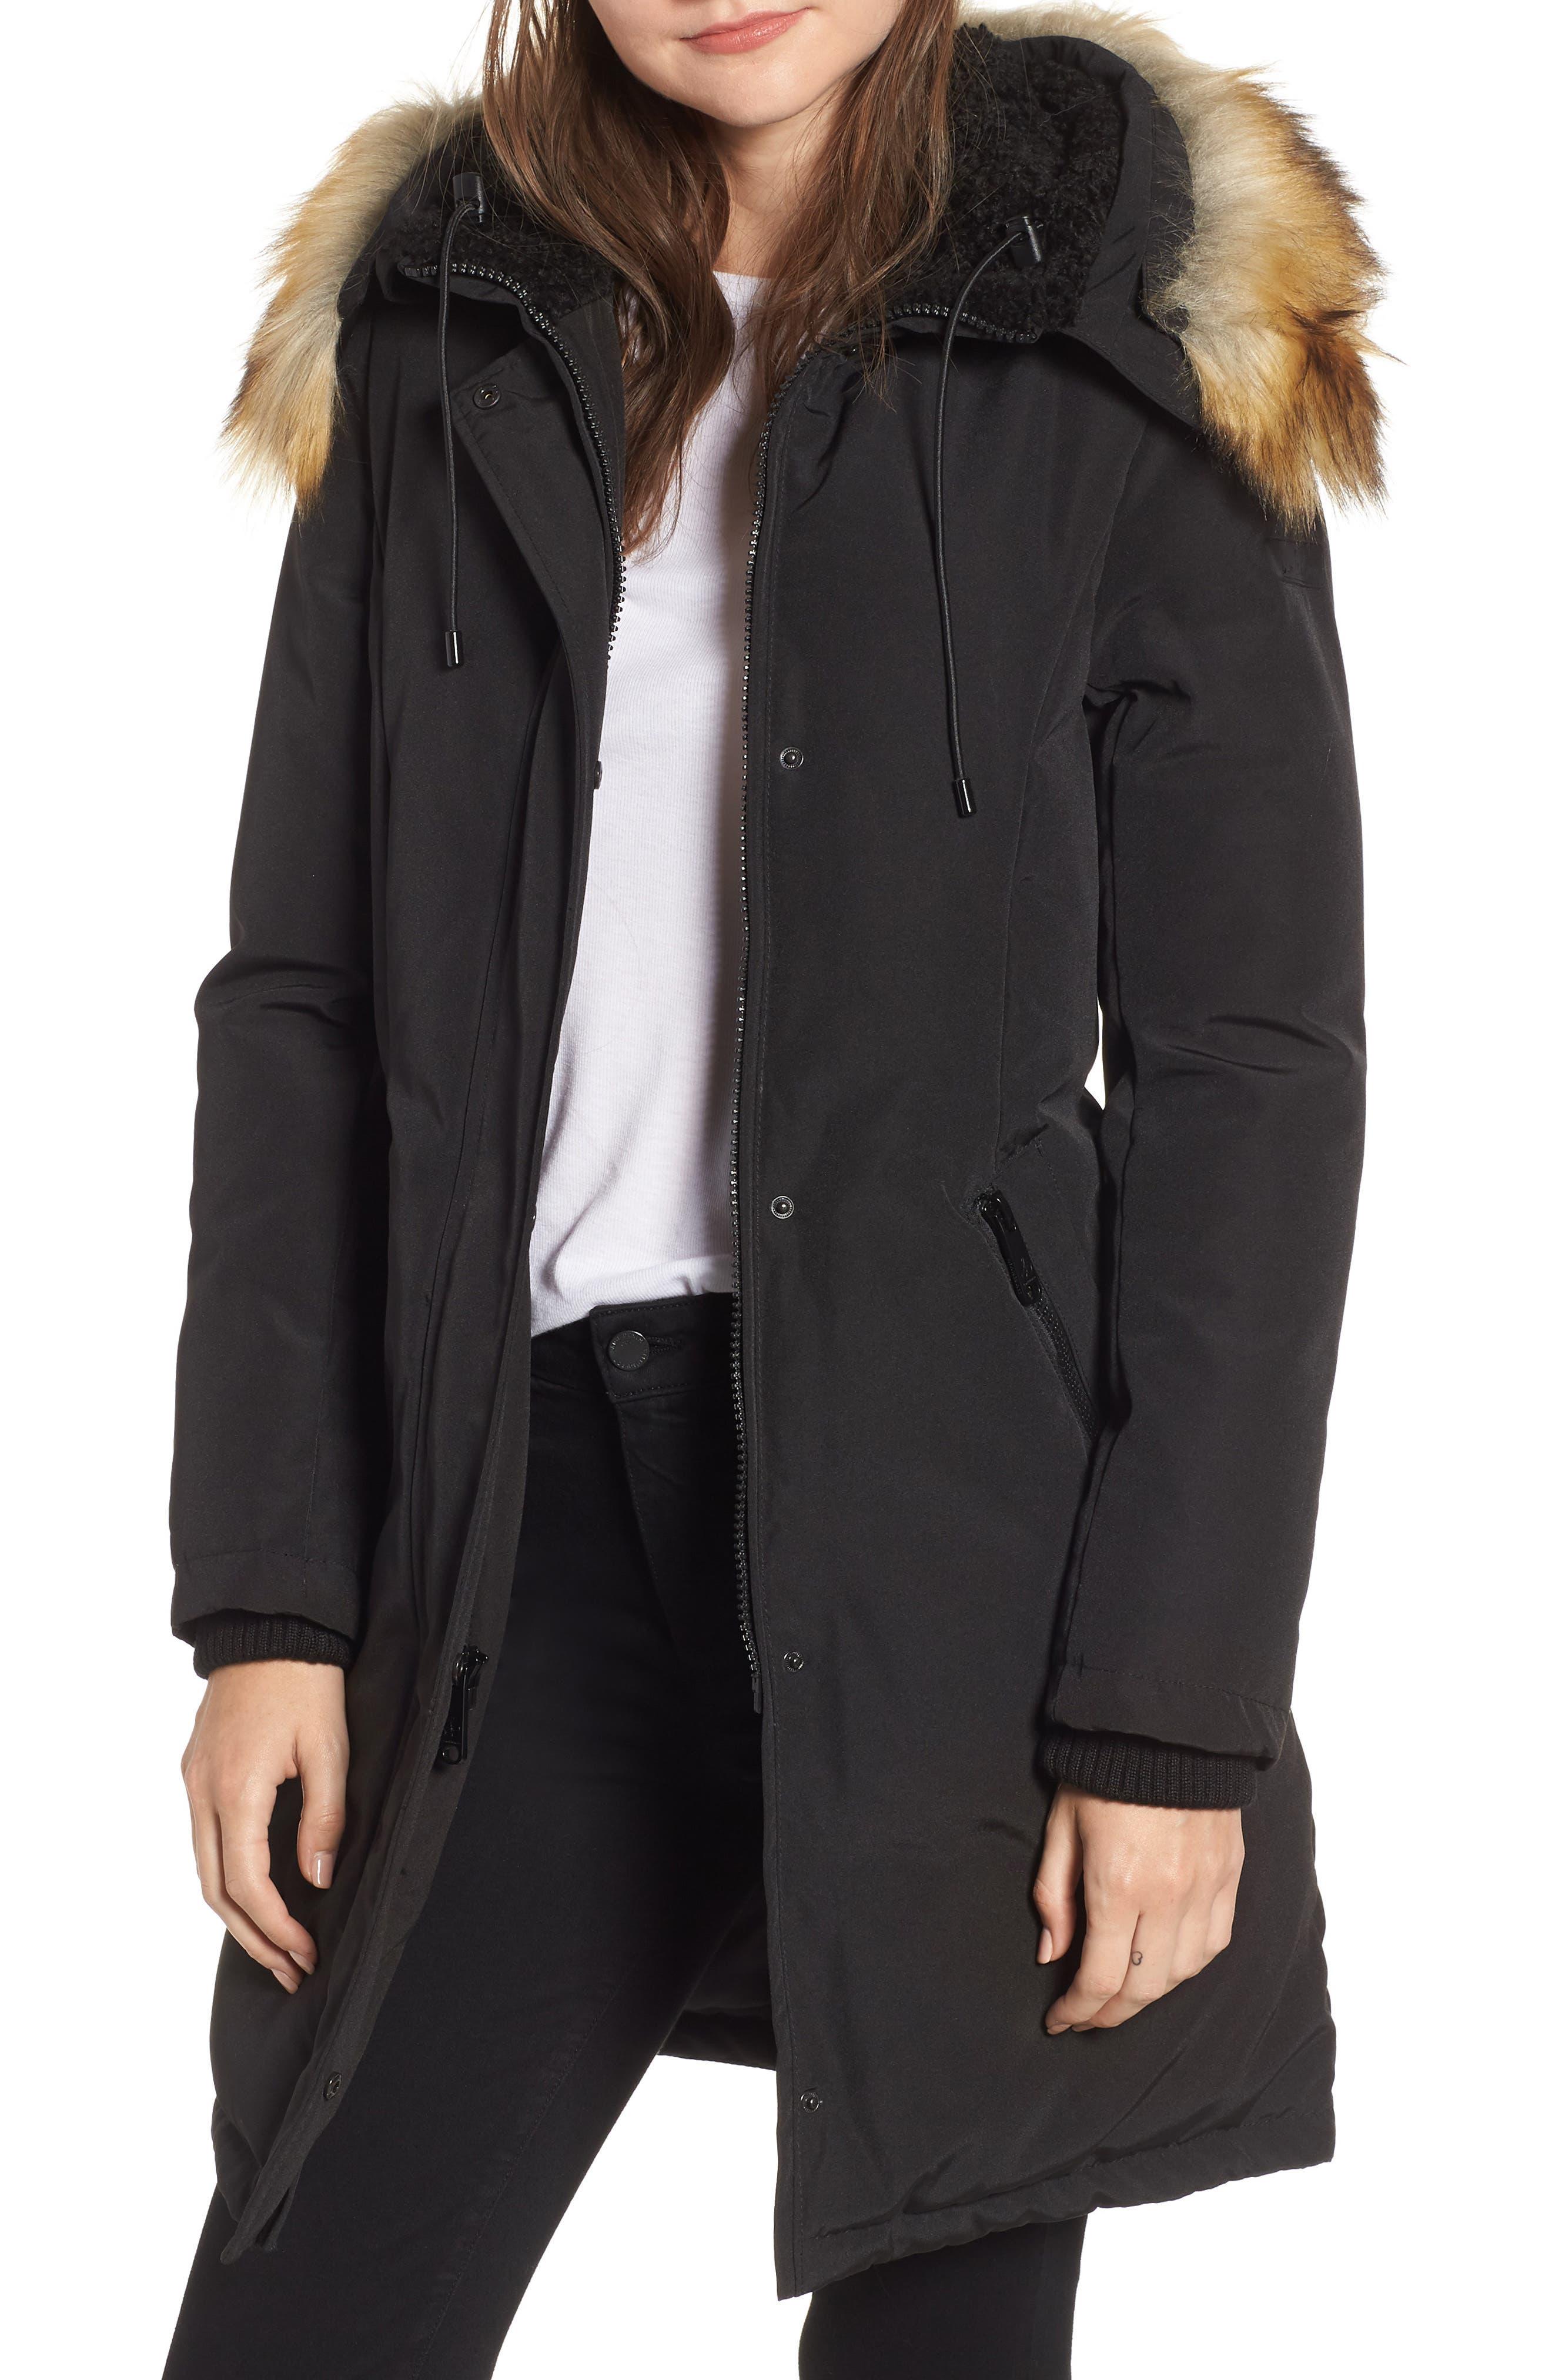 SAM EDELMAN, Faux Fur Trim Down Jacket, Main thumbnail 1, color, 001